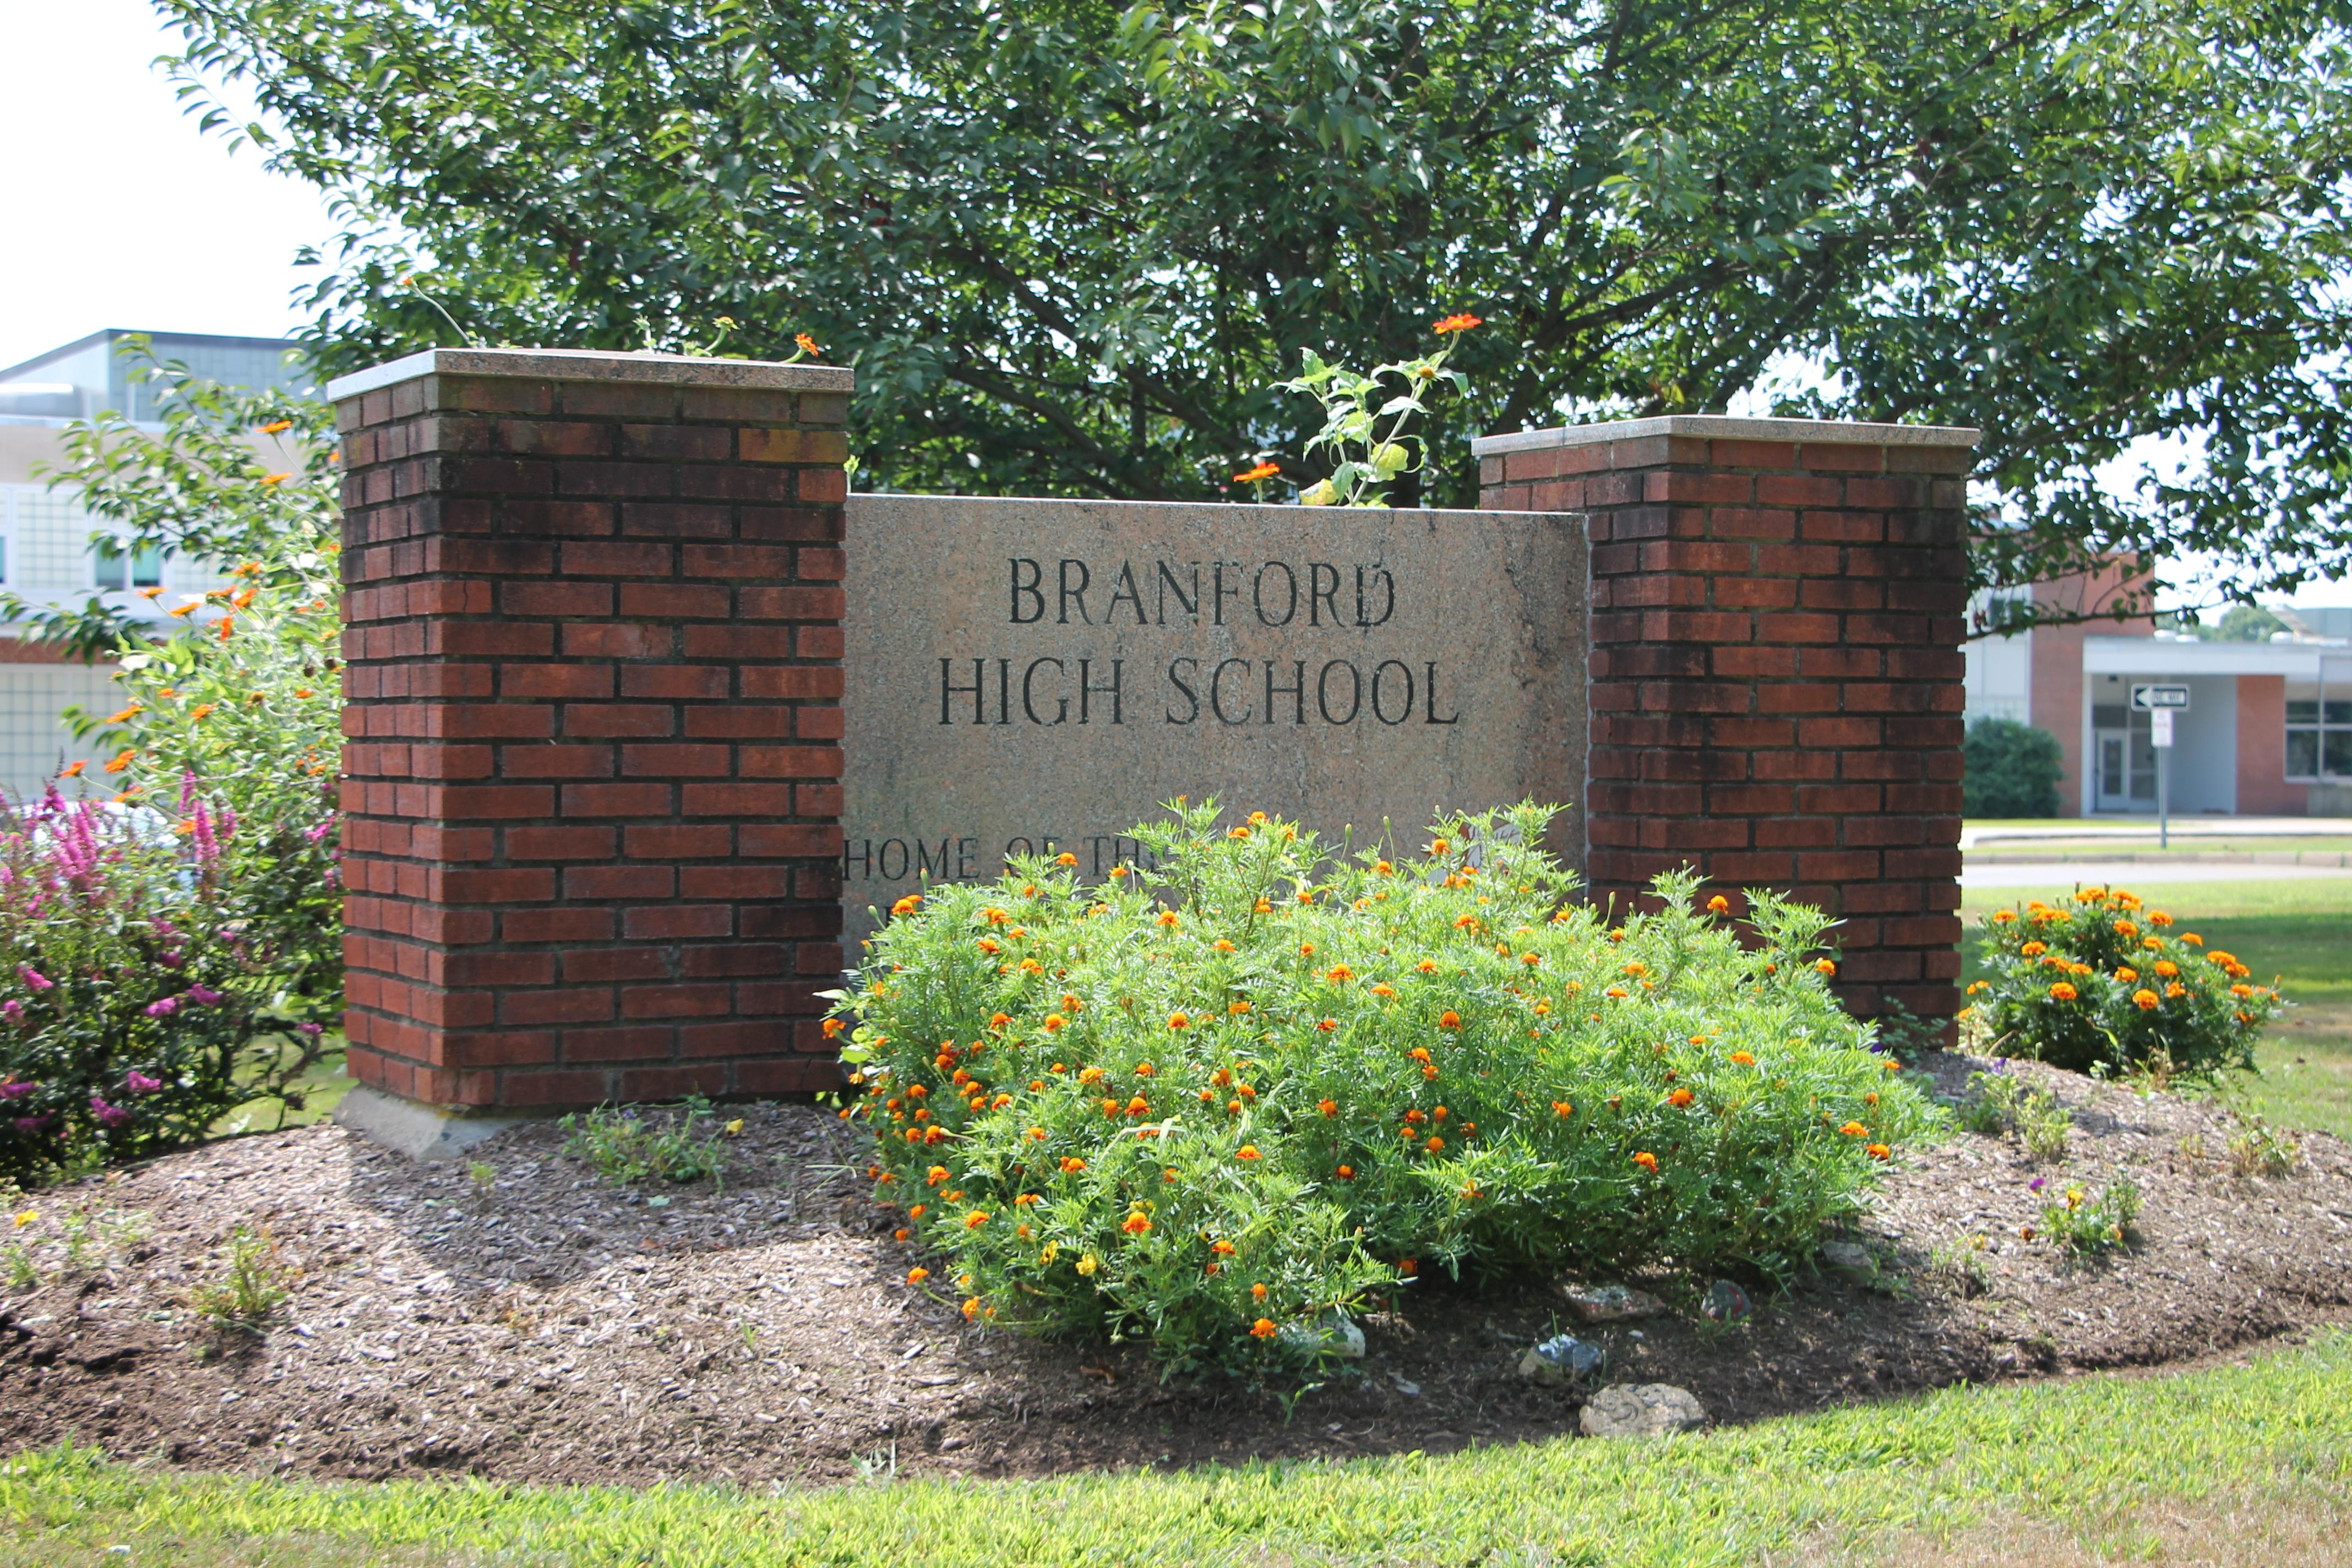 Branford High School Sign